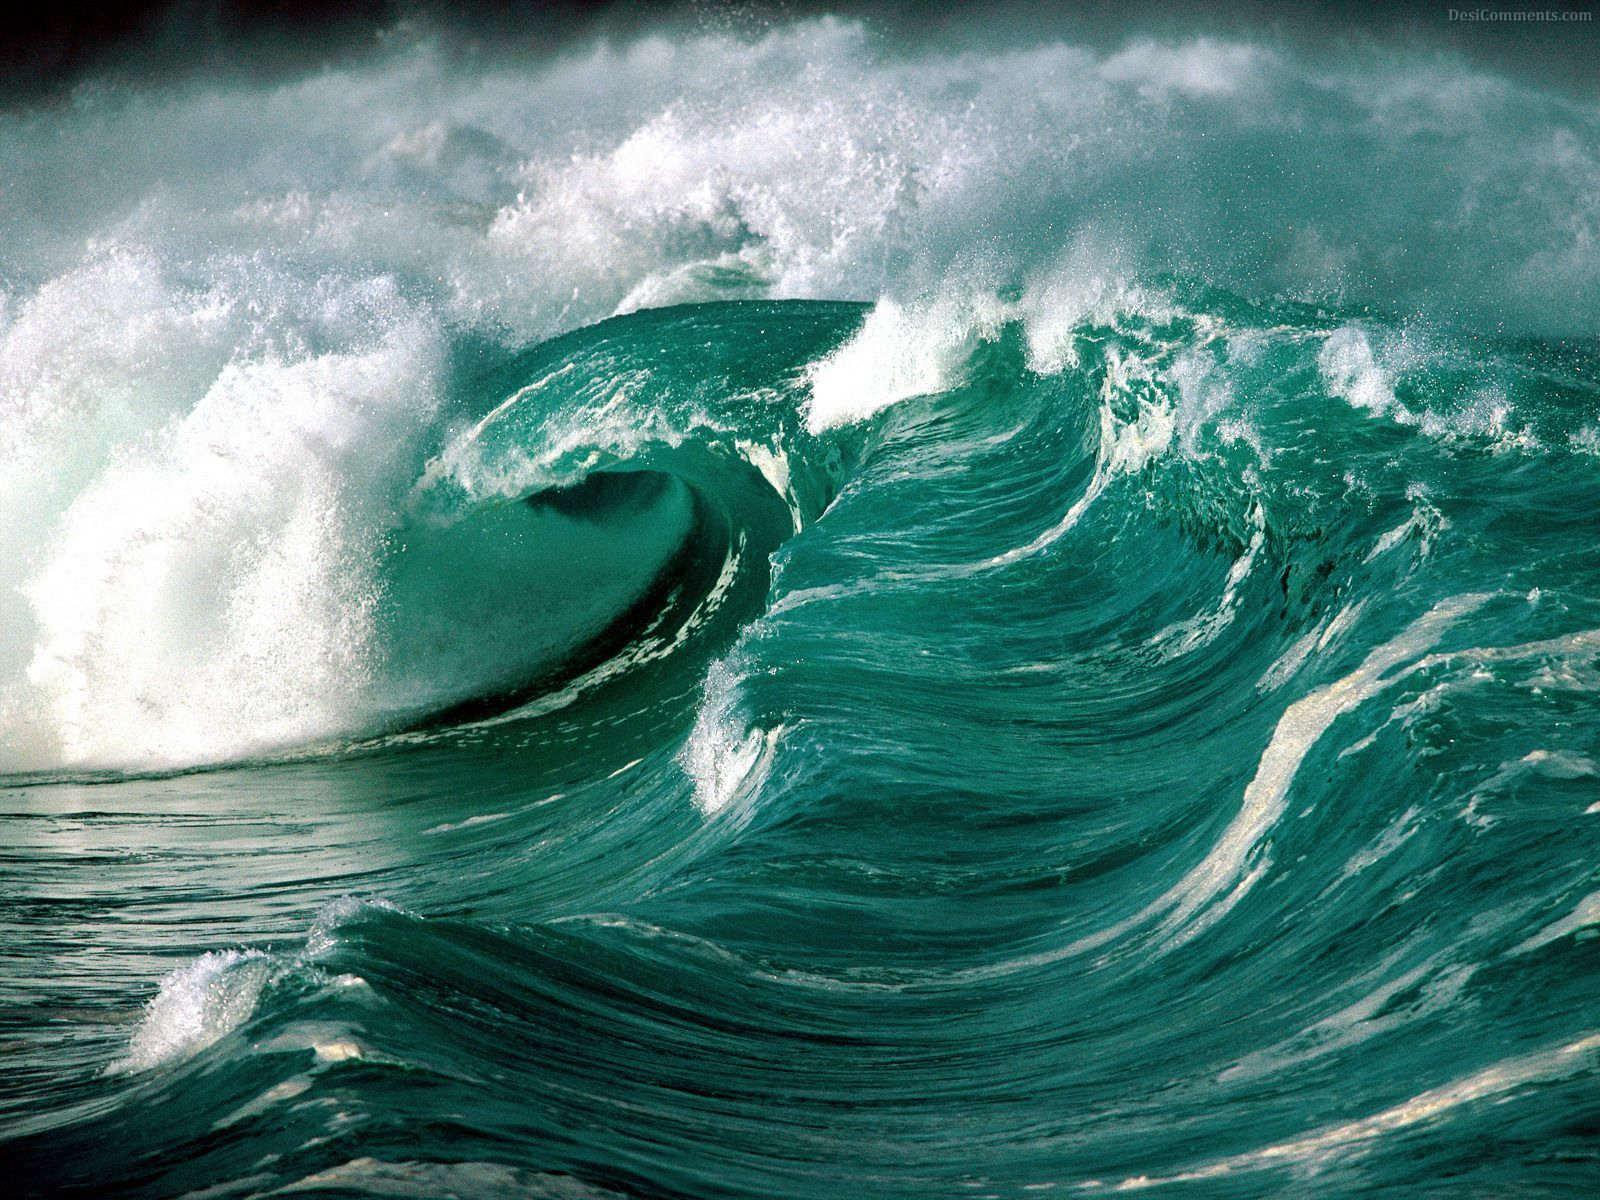 Ocean Wallpaper 35   DesiCommentscom 1600x1200